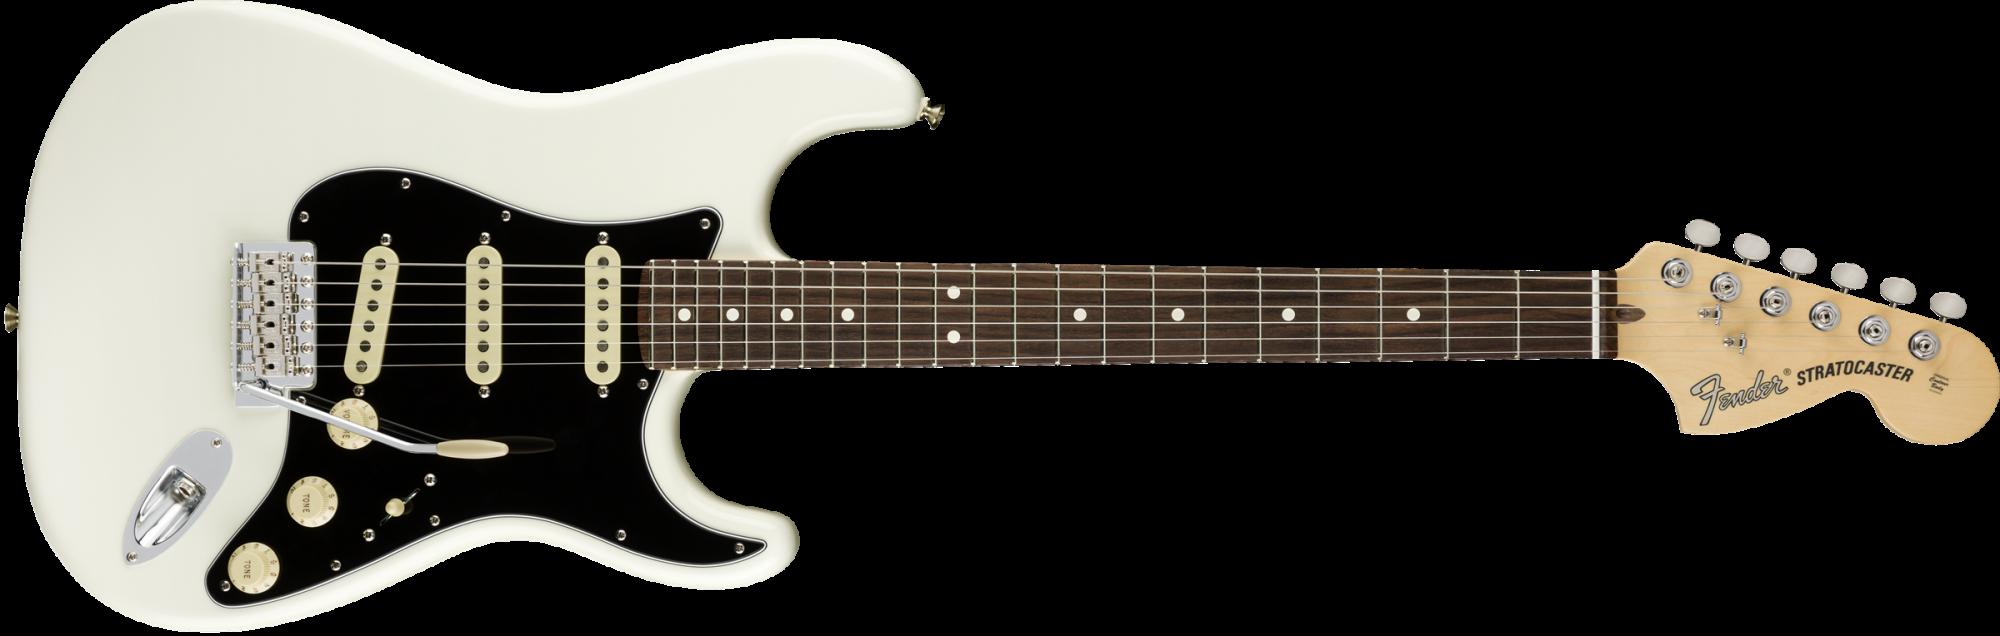 Fender American Performer Stratocaster Guitar - Rosewood Fingerboard - Arctic White